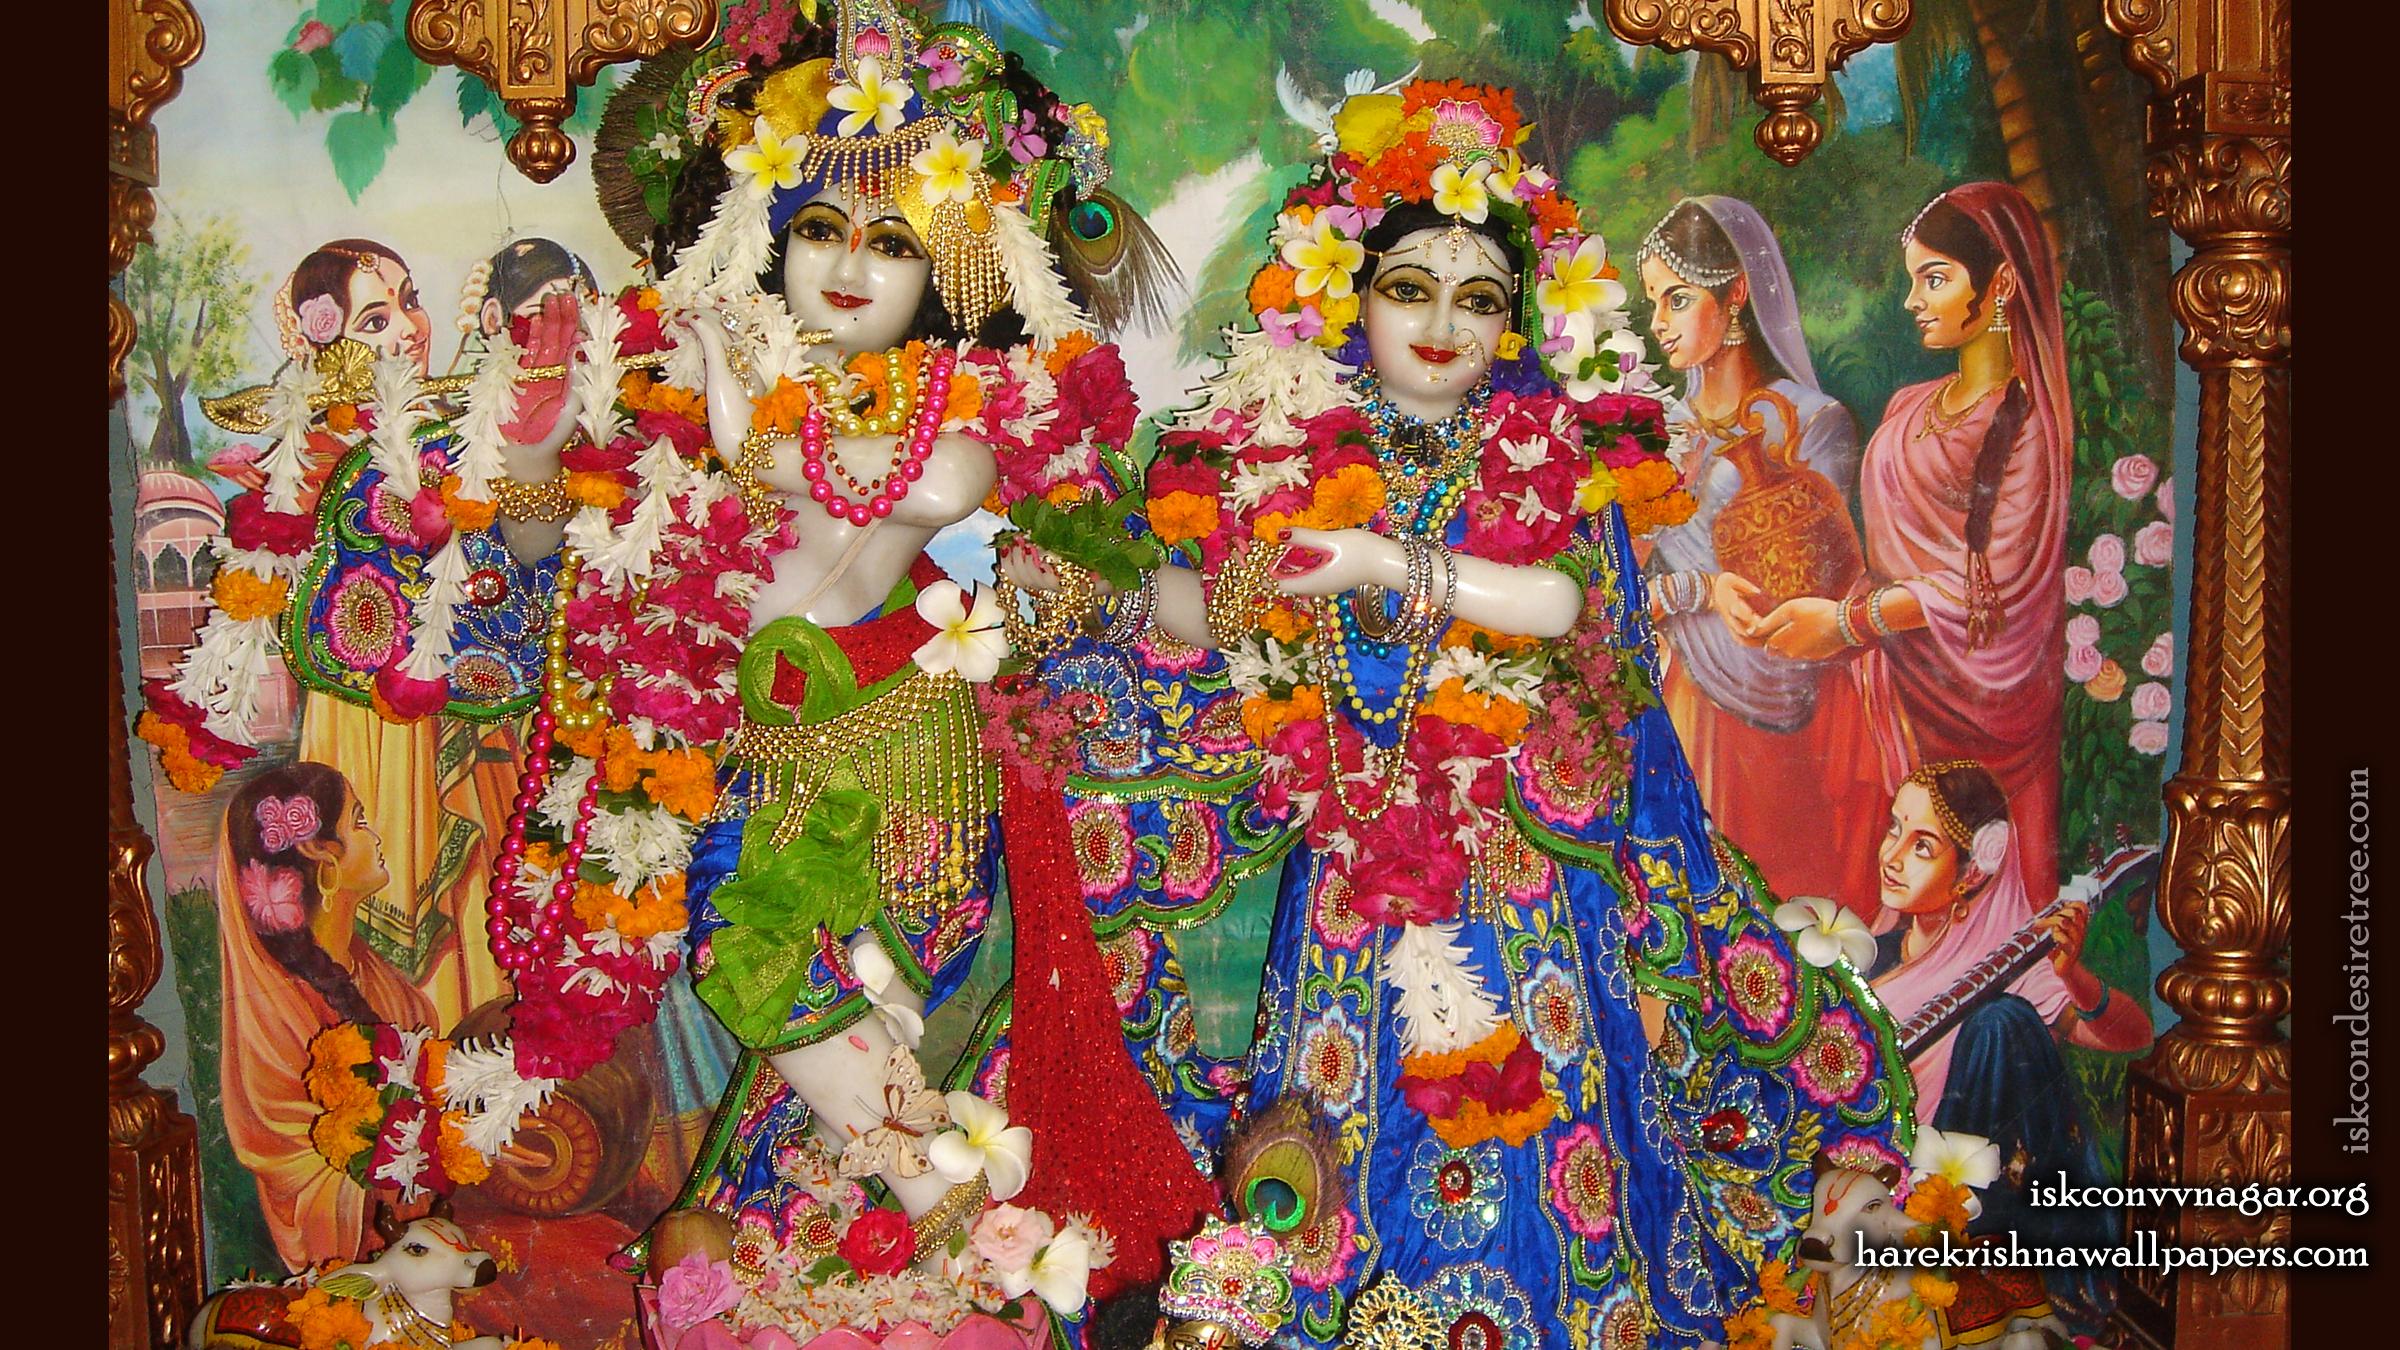 Sri Sri Radha Giridhari Wallpaper (026) Size 2400x1350 Download